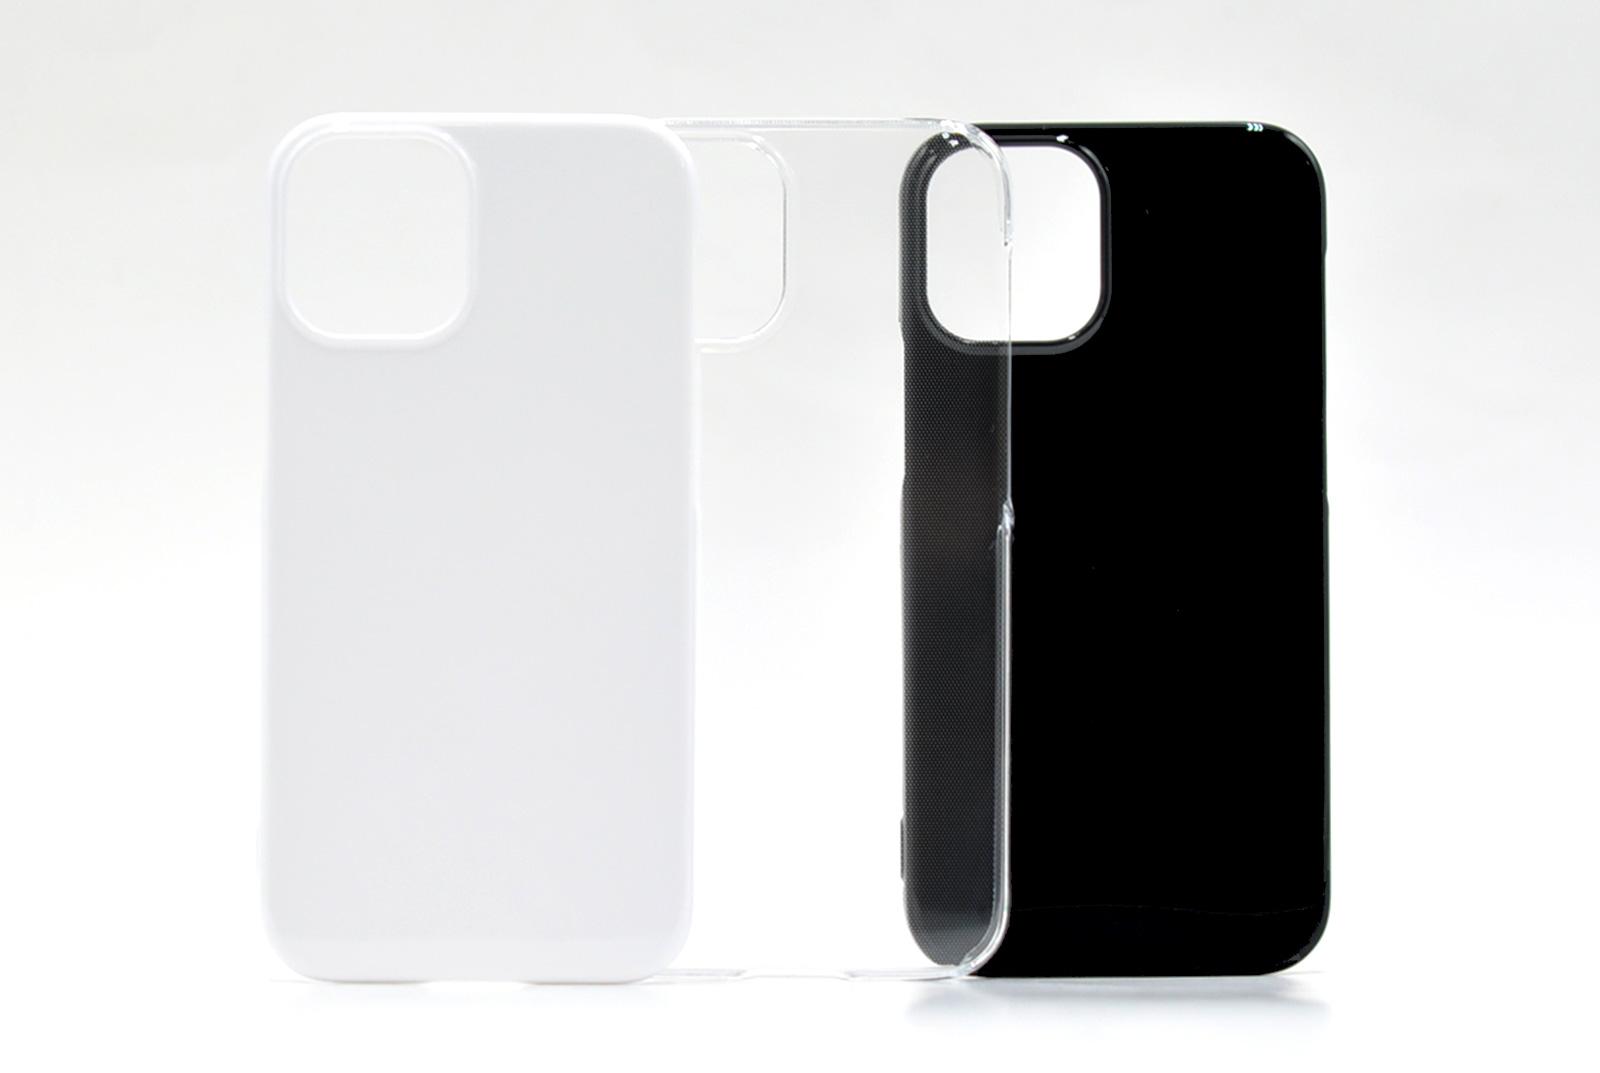 iPhone 12 miniケースカラー